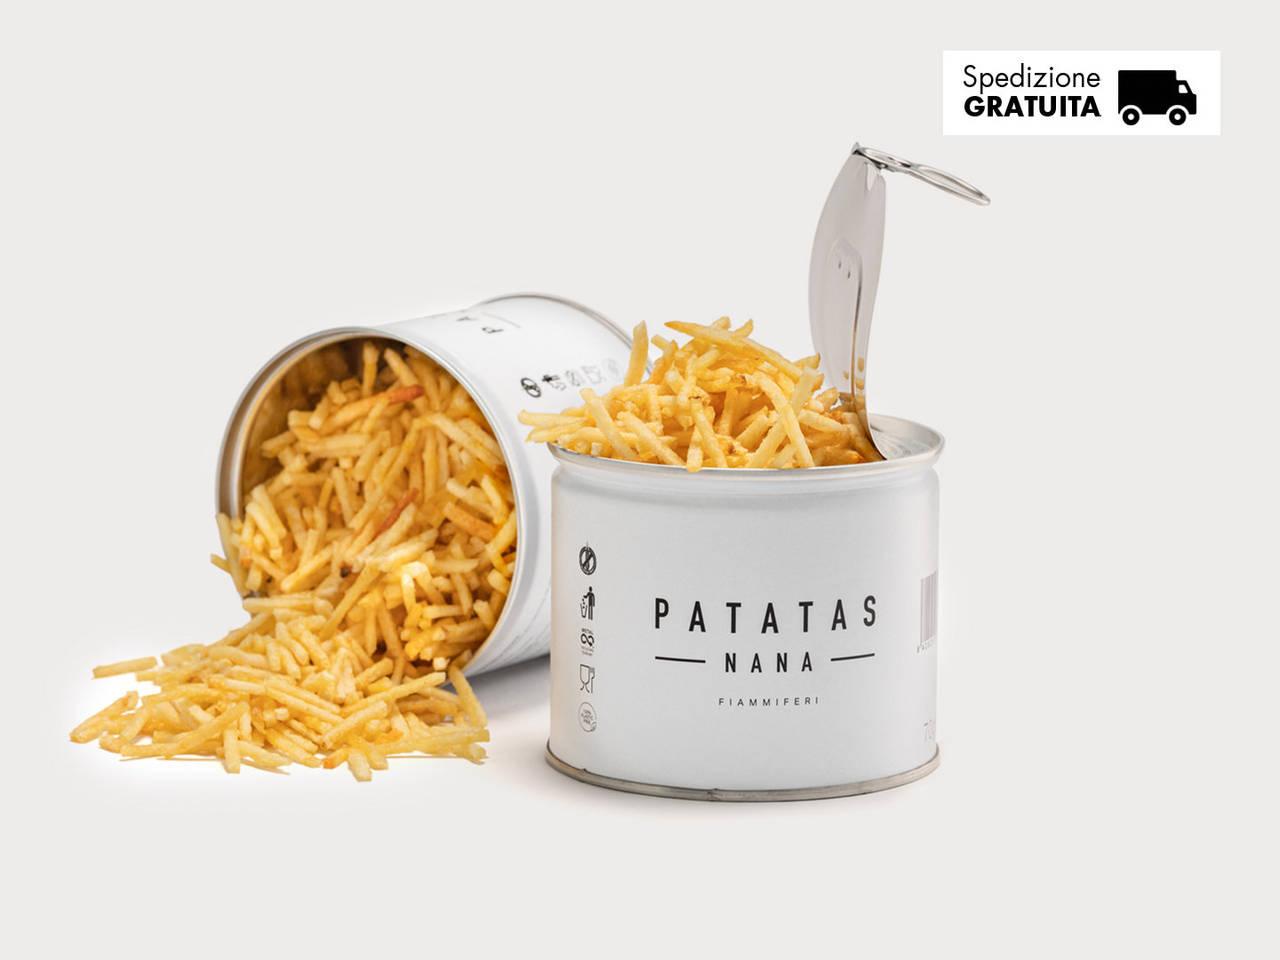 Patatas Nana, patatine gourmet